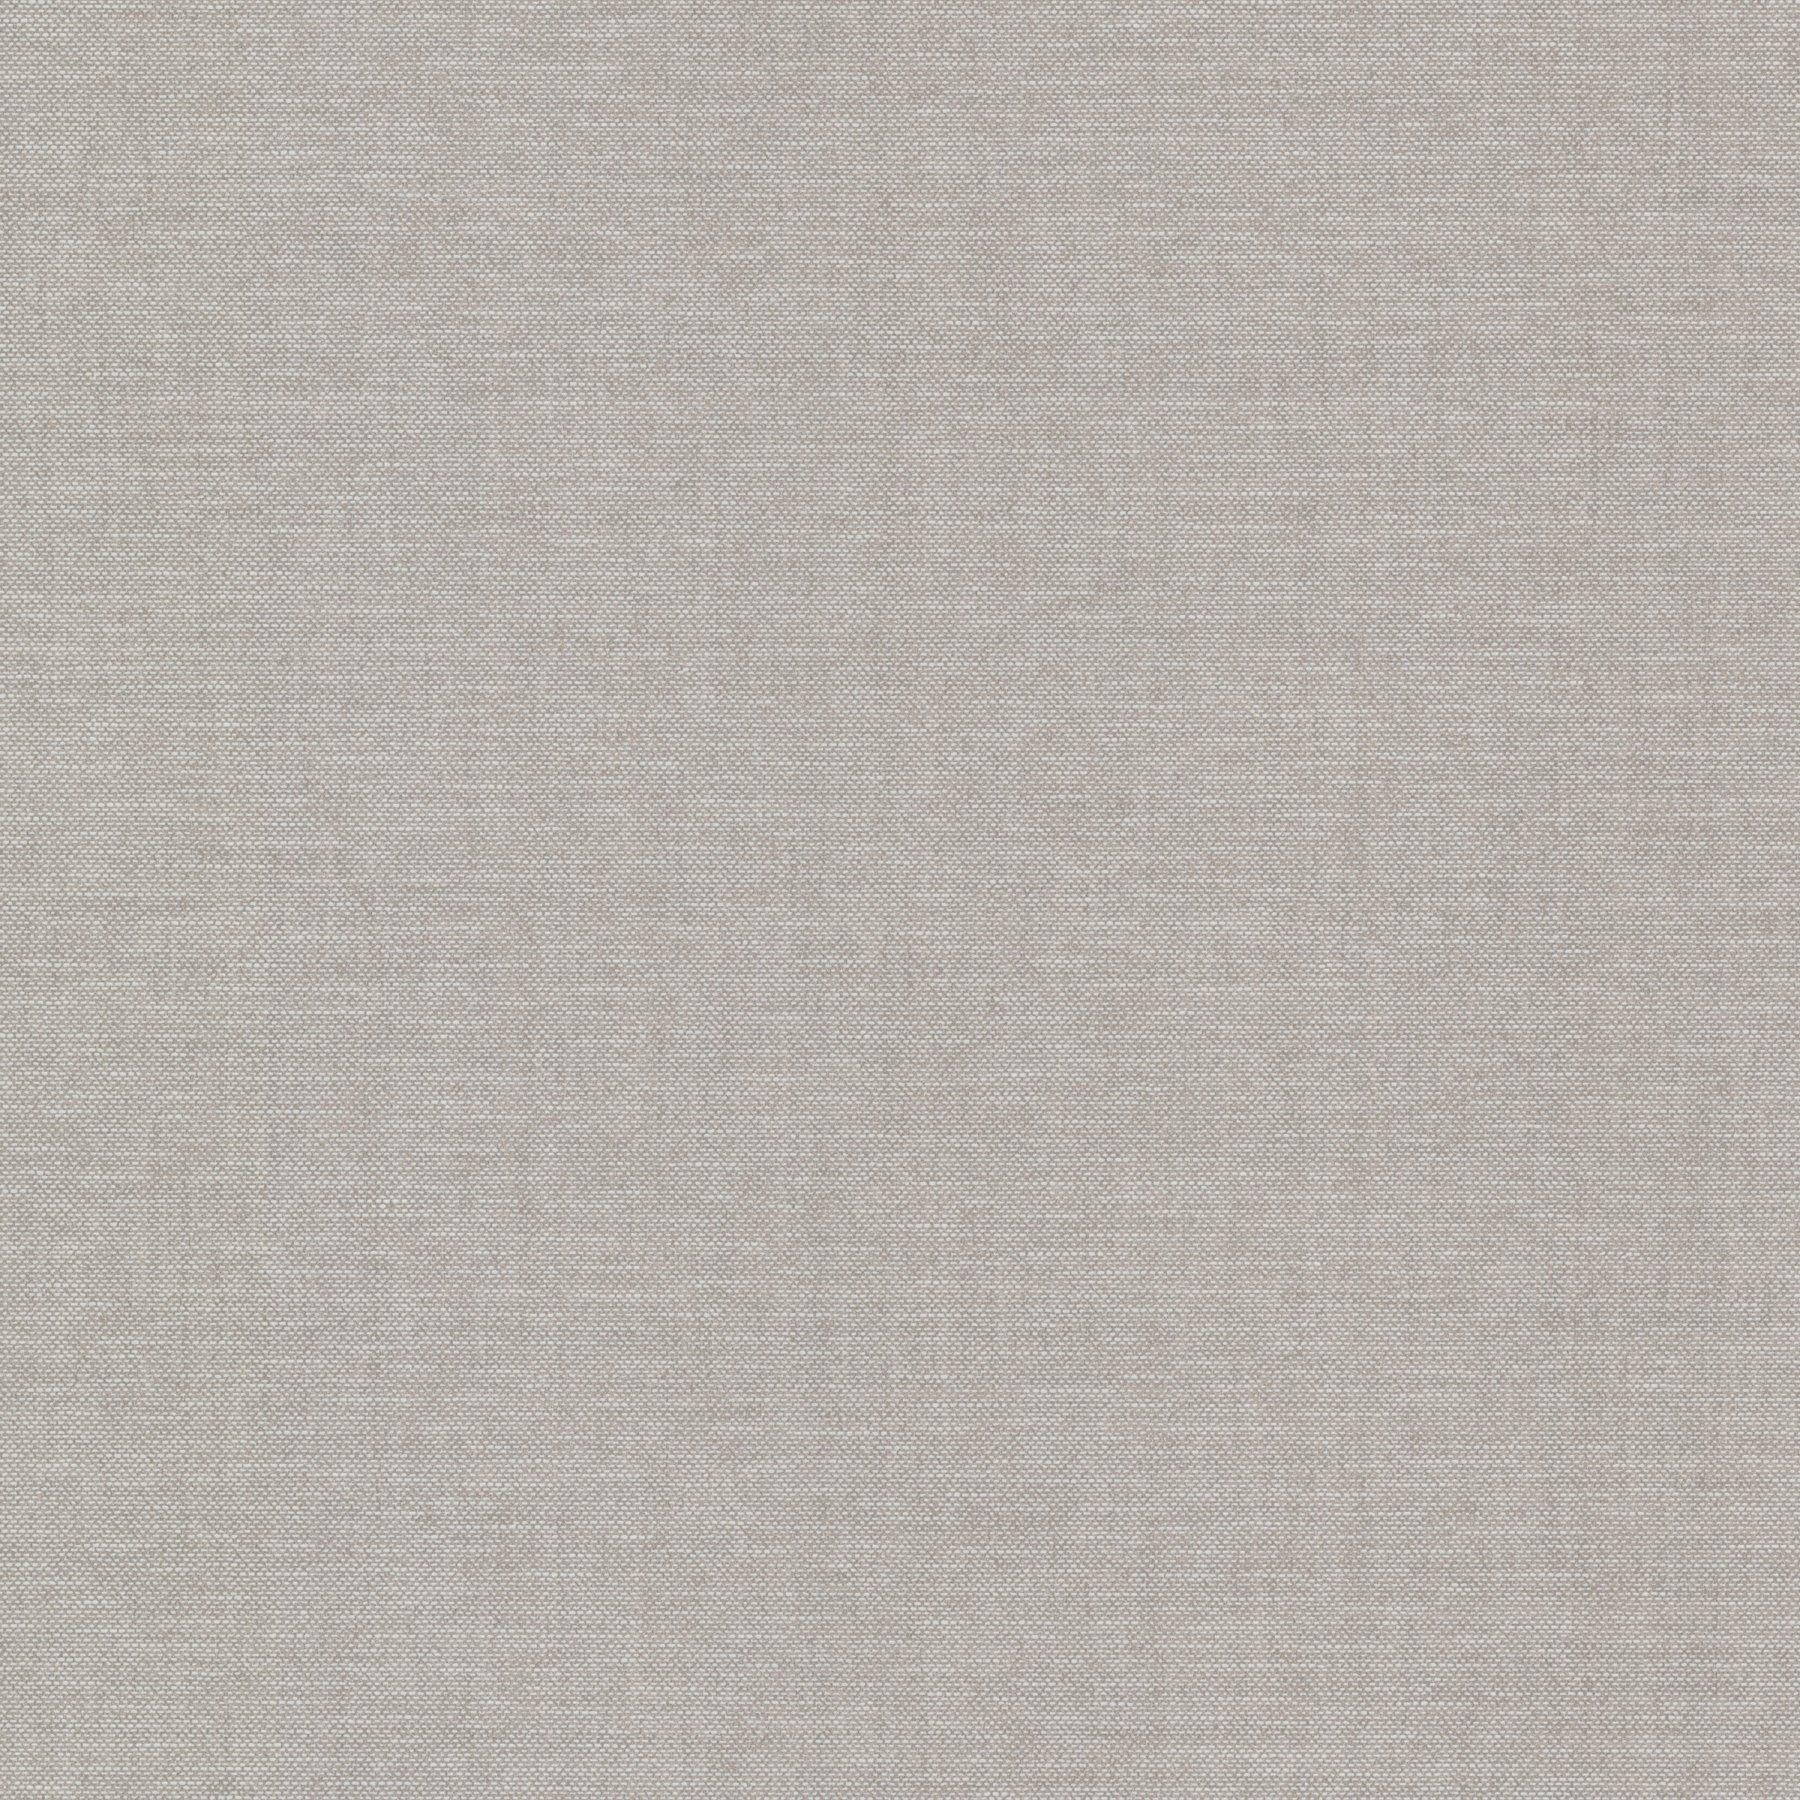 Kenneth James 671-68514 Valois Linen Texture Wallpaper, Taupe